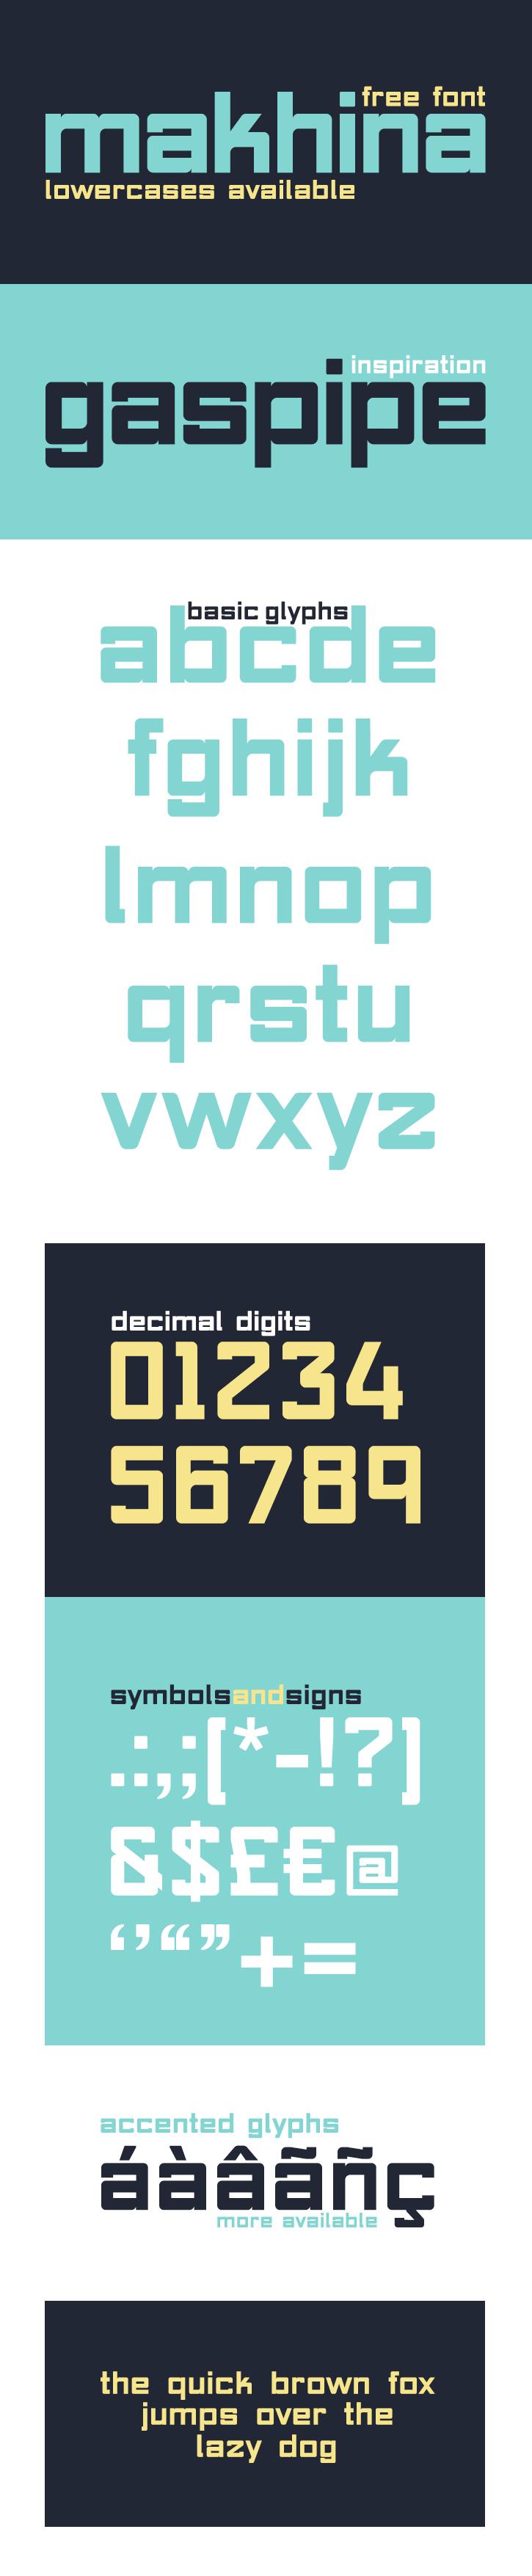 Makhina Free Font